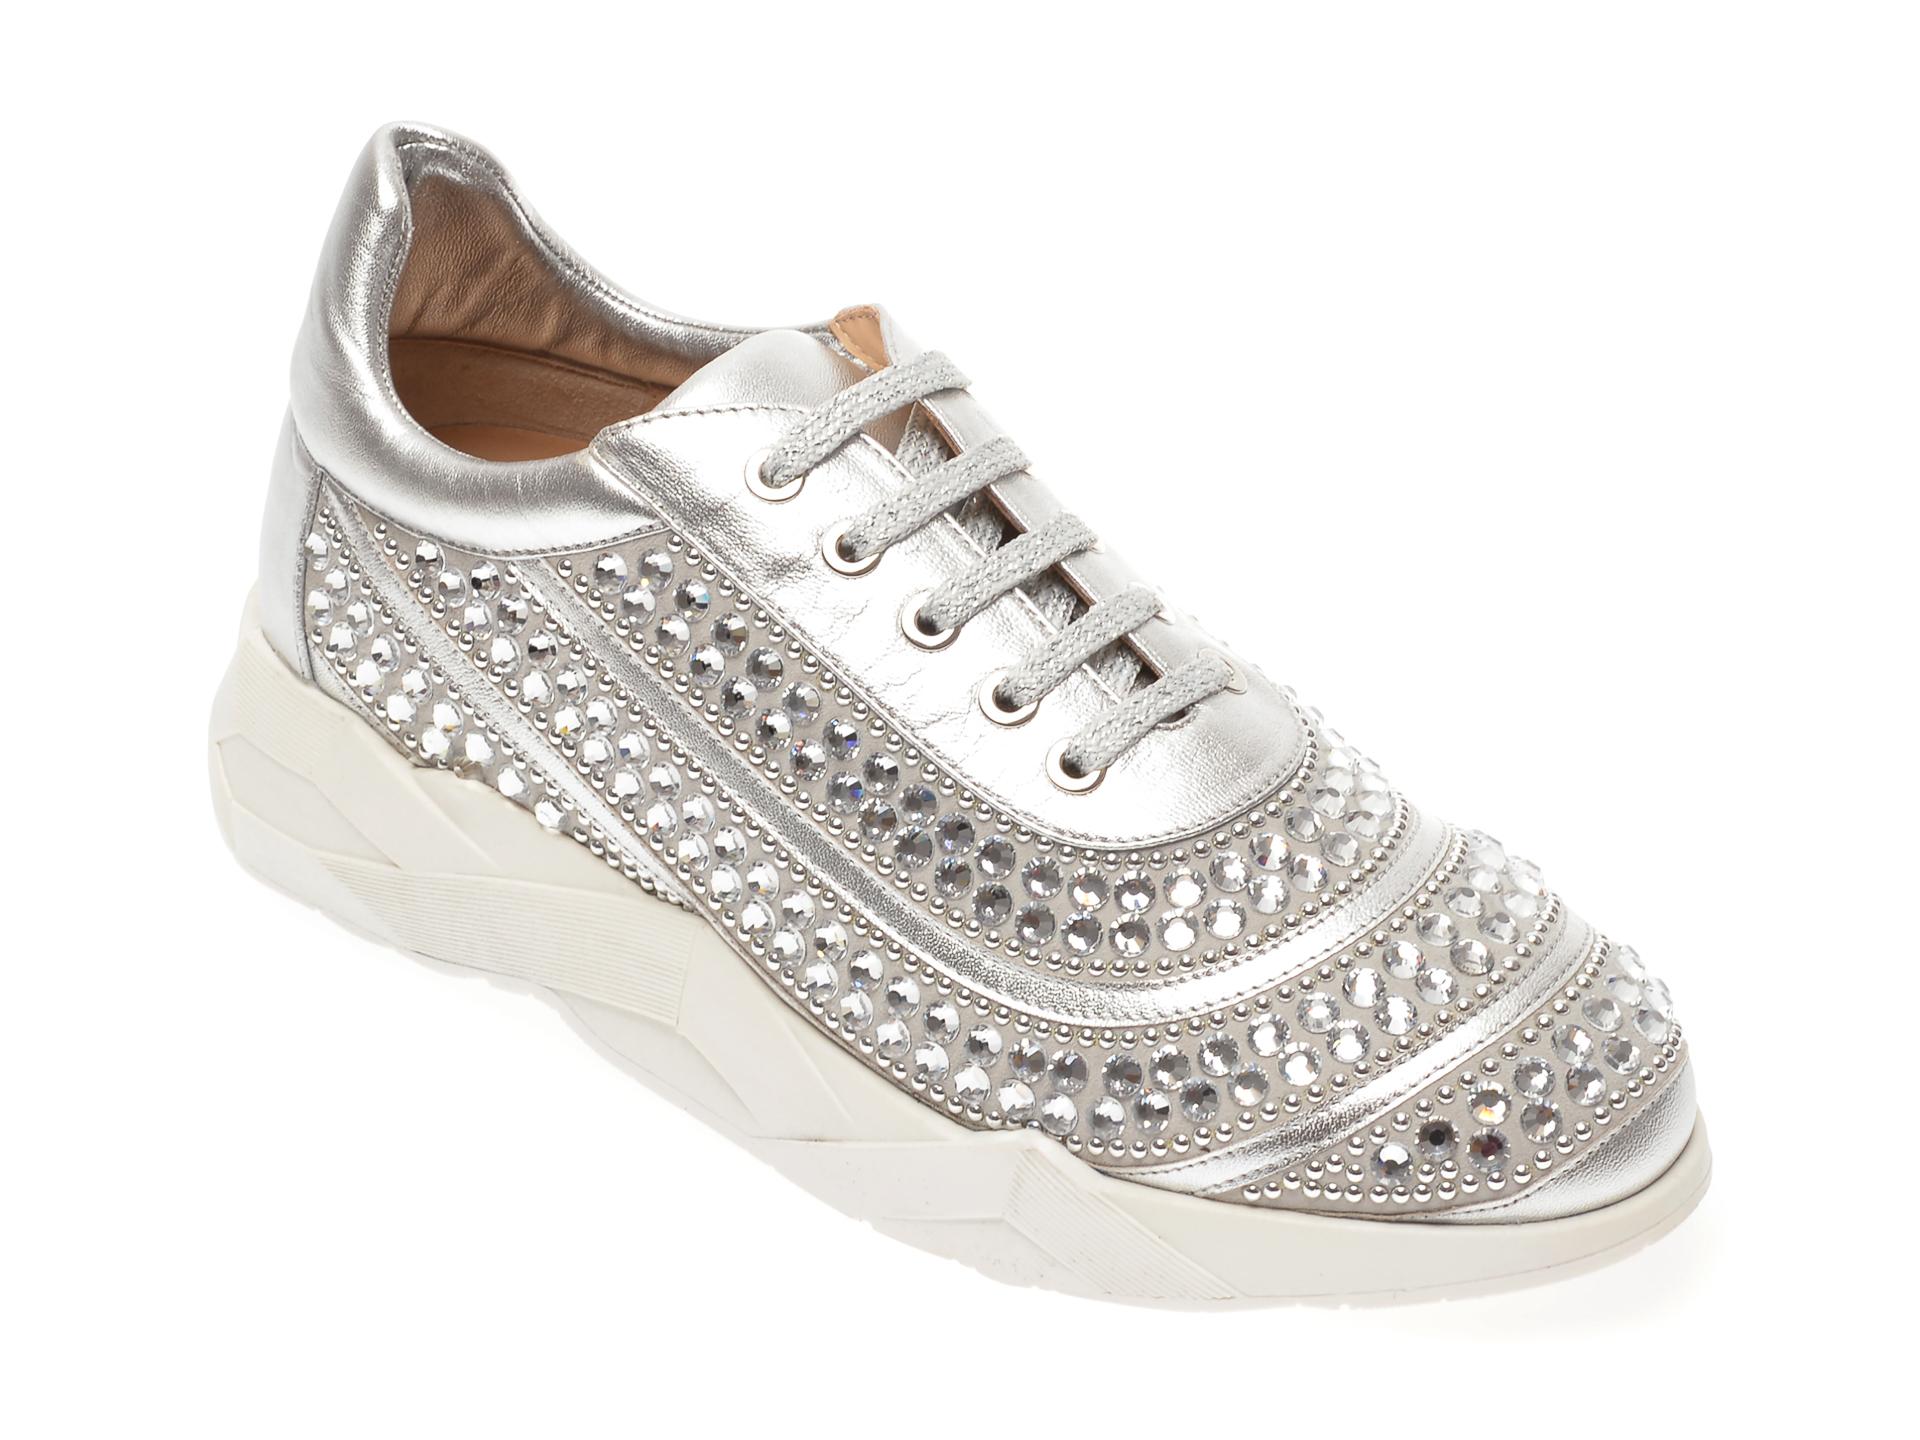 Pantofi LORIBLU argintii, 16433, din piele naturala